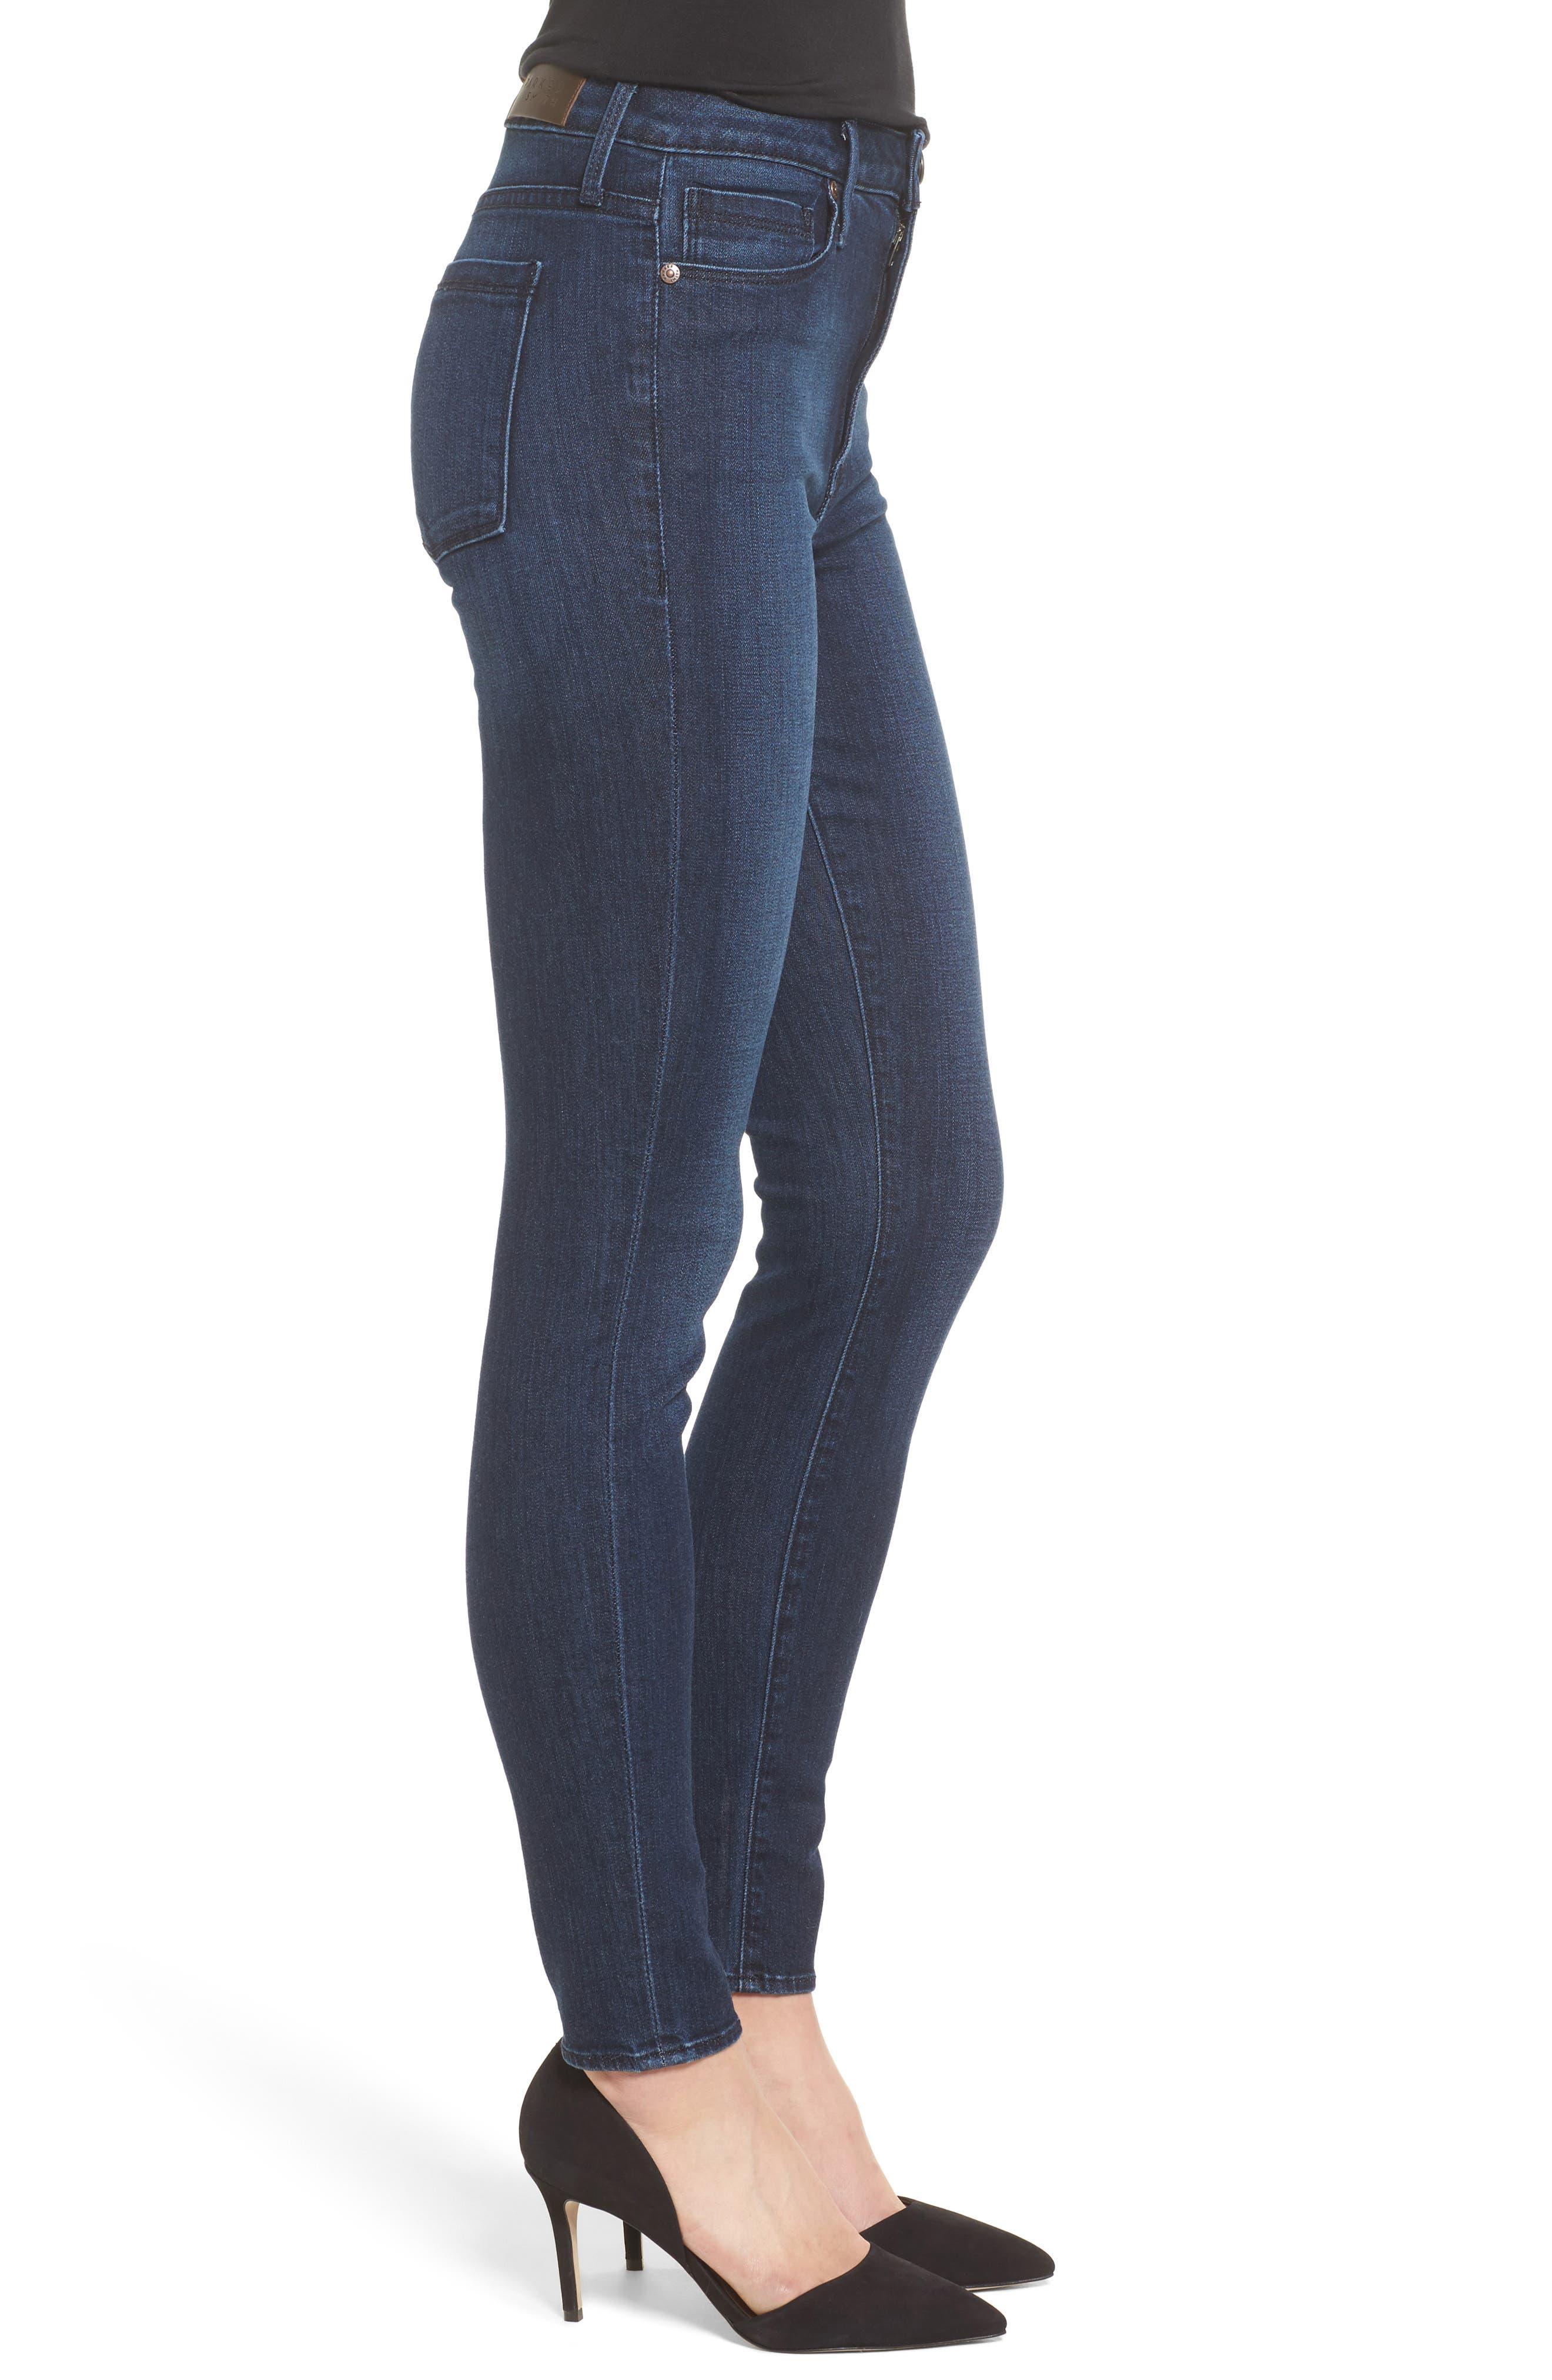 Bombshell High Waist Stretch Skinny Jeans,                             Alternate thumbnail 9, color,